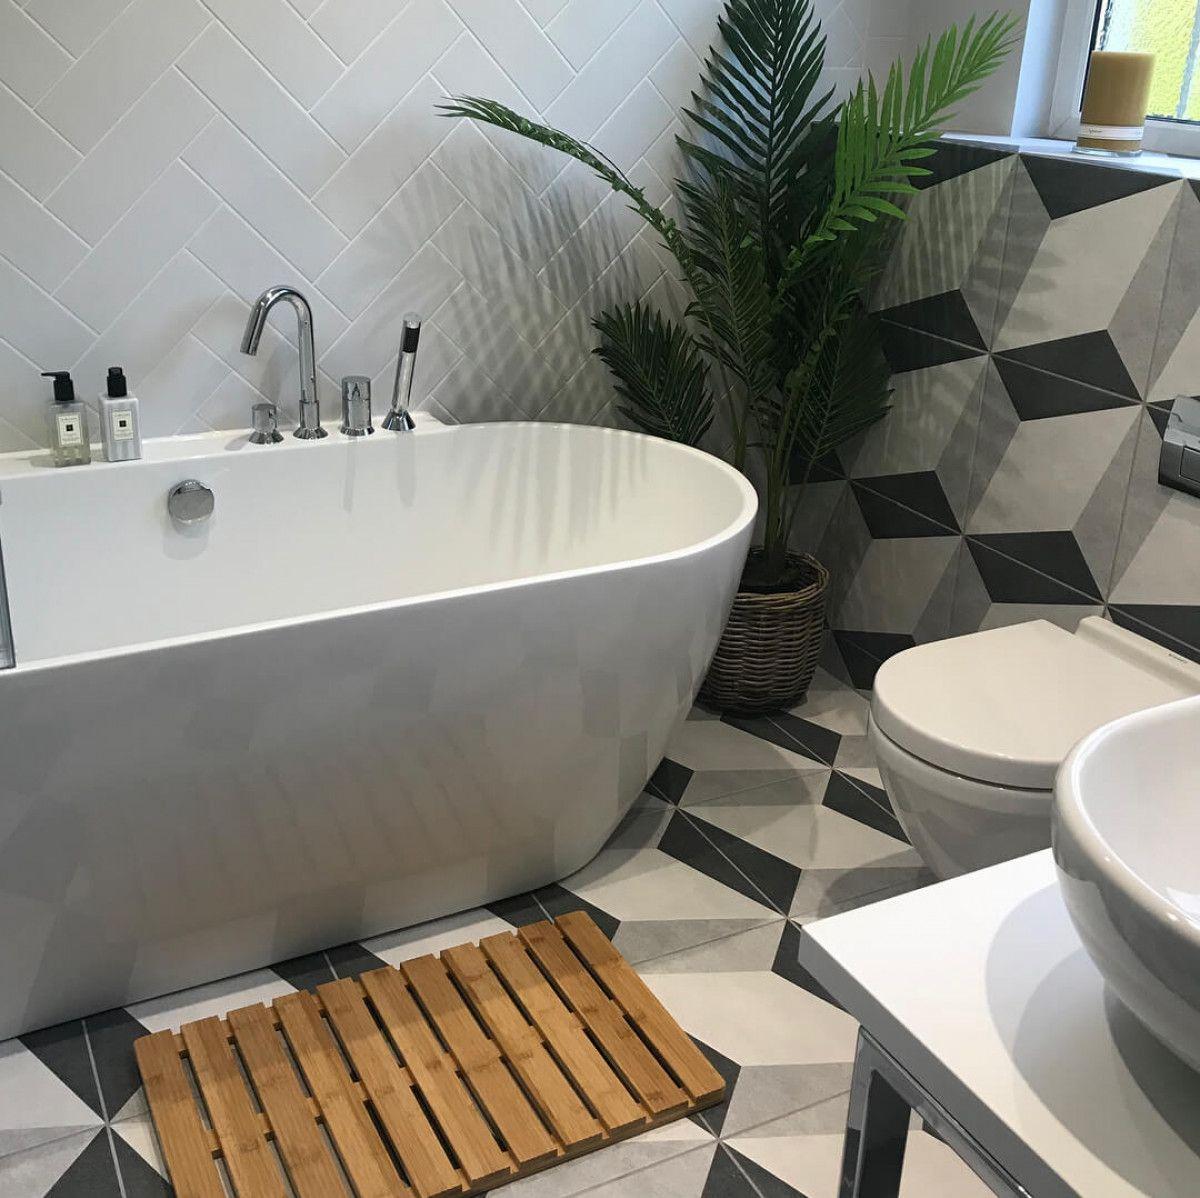 9 Fresh, Budget-Friendly Ideas For Small Bathrooms